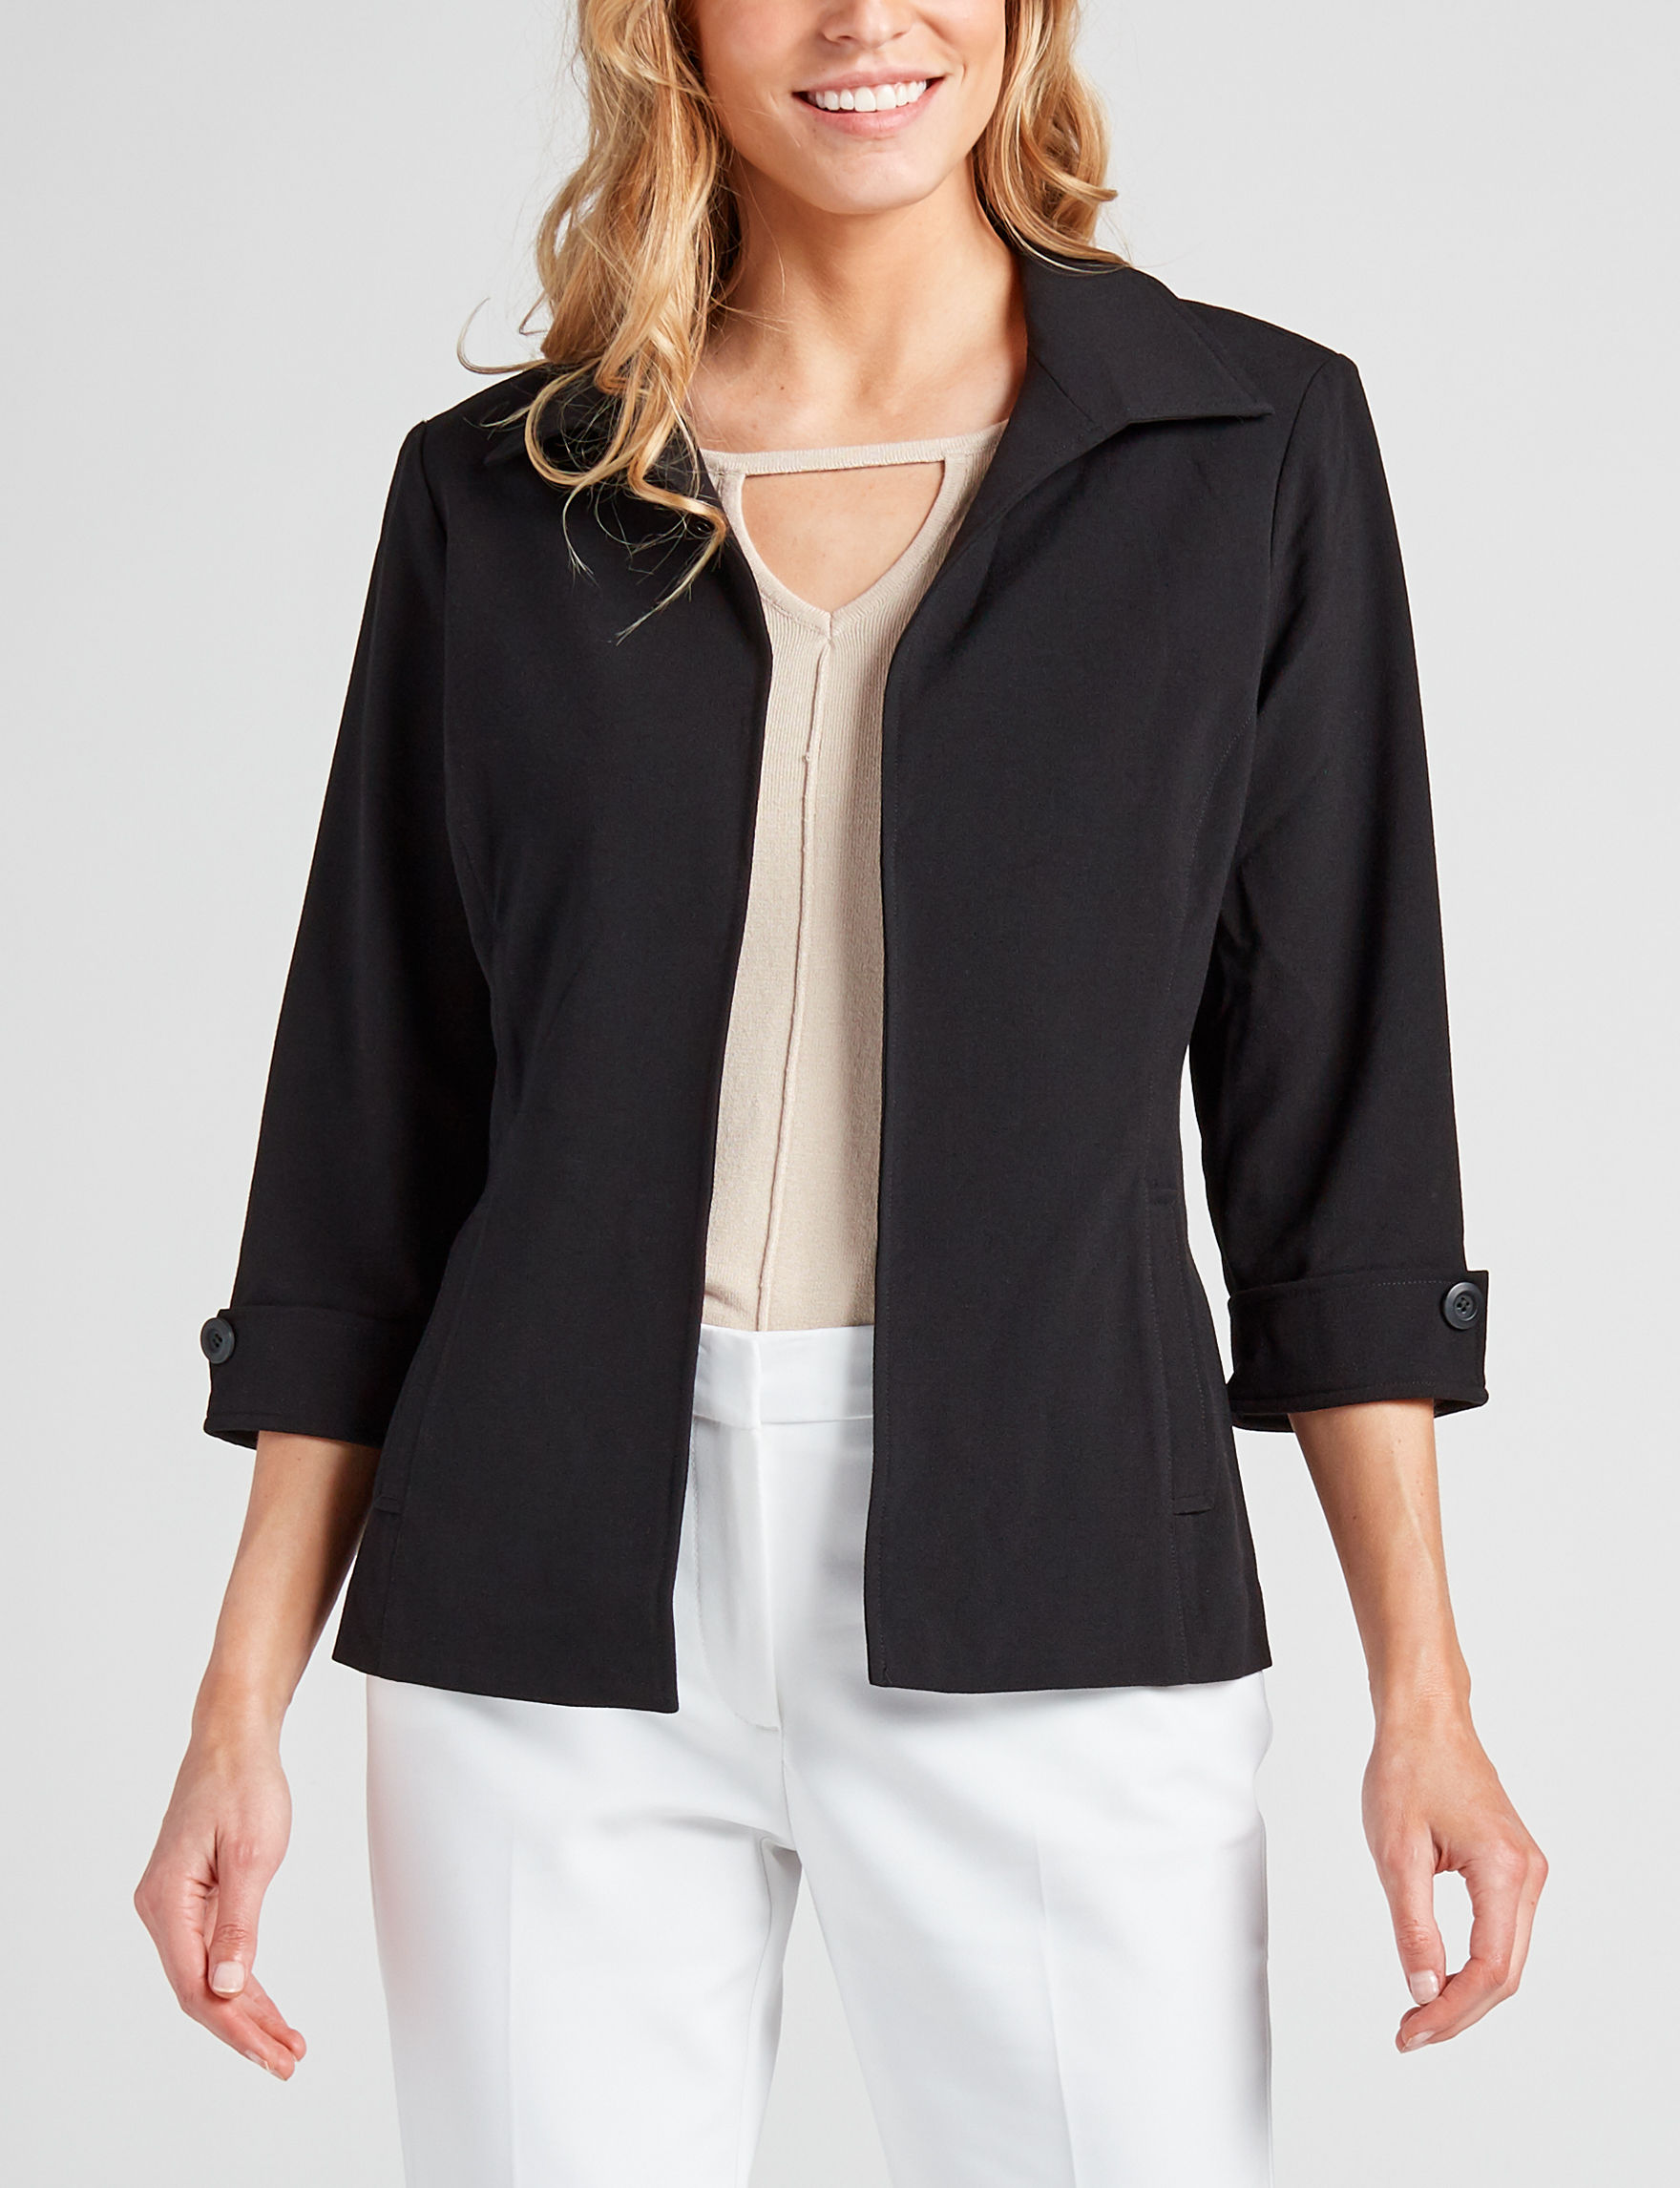 Valerie Stevens Black Lightweight Jackets & Blazers